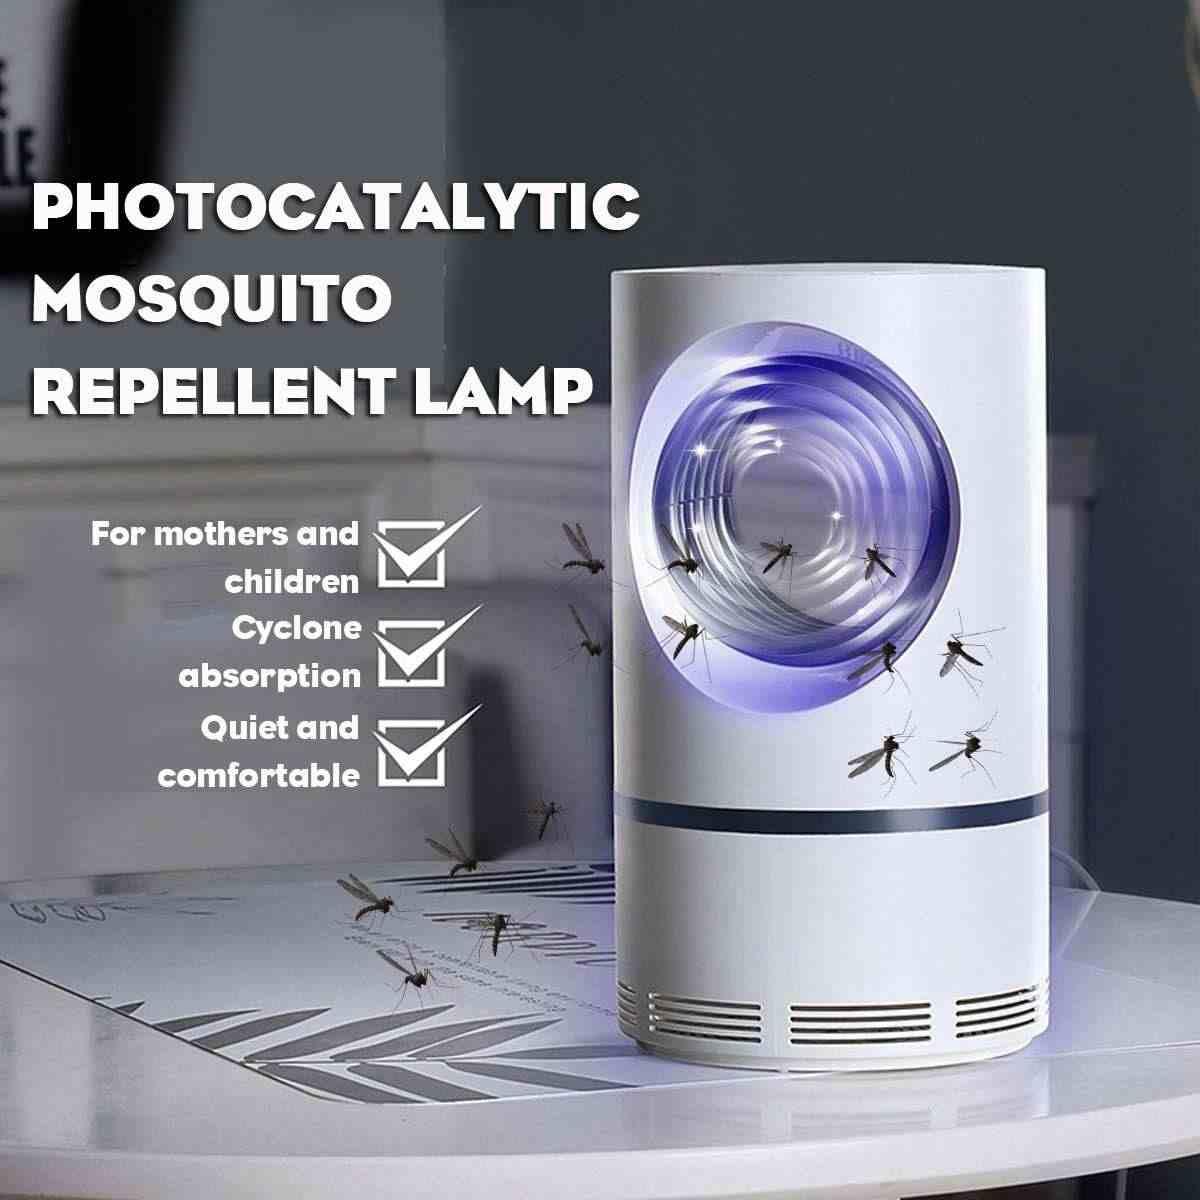 110-220 V USB Fotokatalitik Nyamuk Lampu LED Bug Anti Nyamuk Lampu Perangkap Serangga Rumah Ruang Tamu Kamar pengendalian Hama